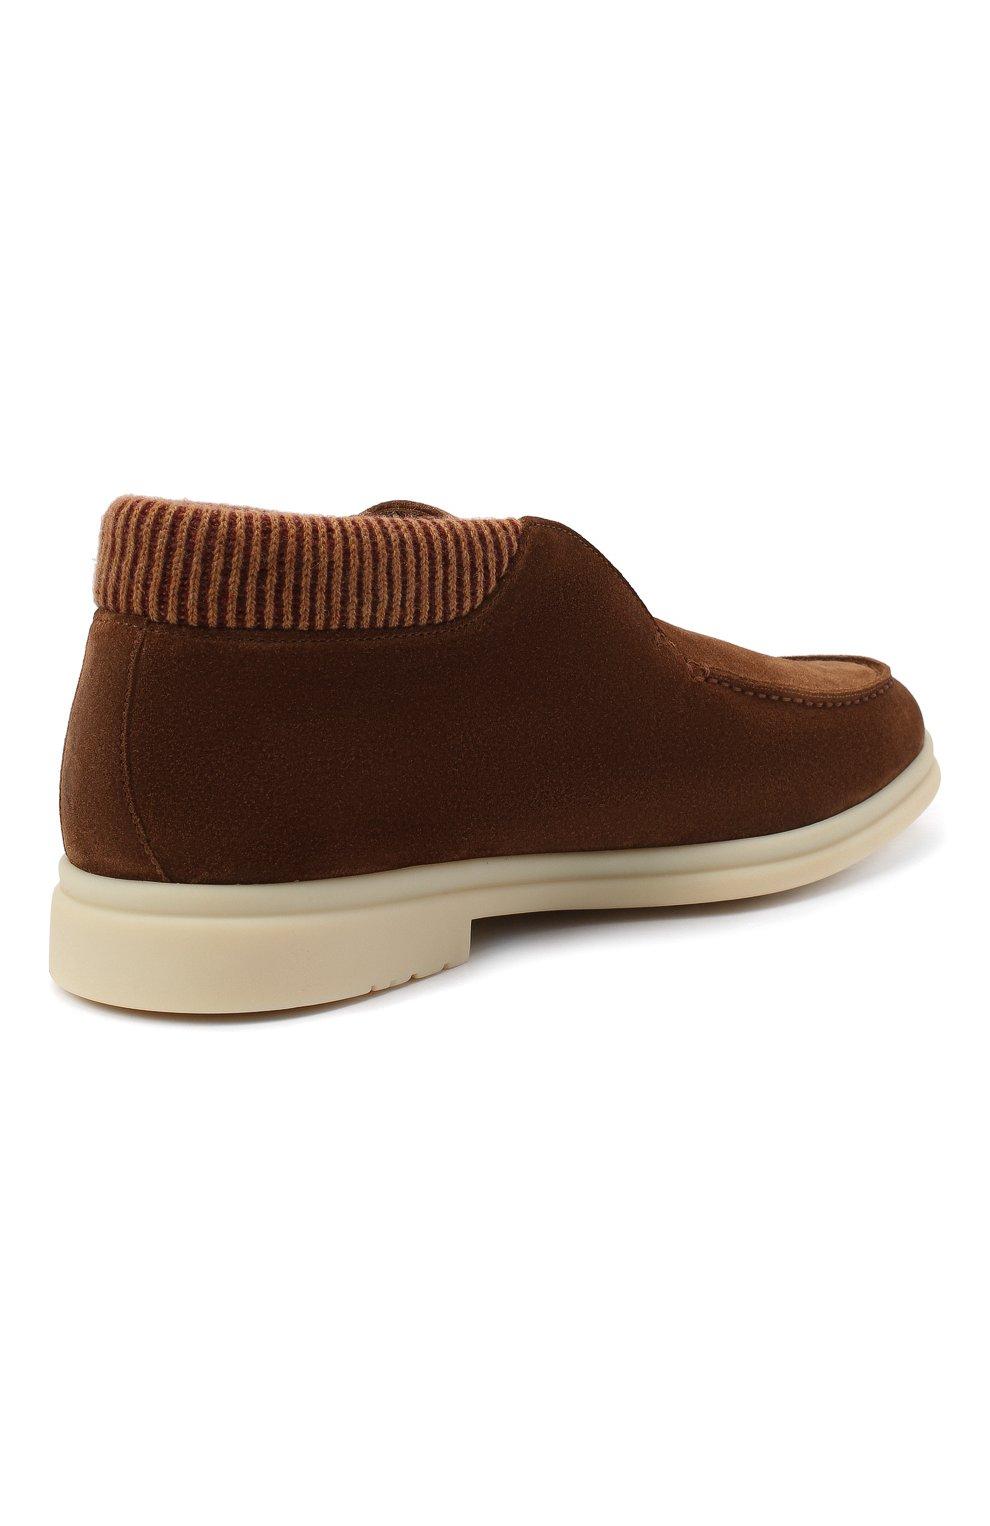 Мужские замшевые ботинки open wintery walk LORO PIANA светло-коричневого цвета, арт. FAL4735   Фото 4